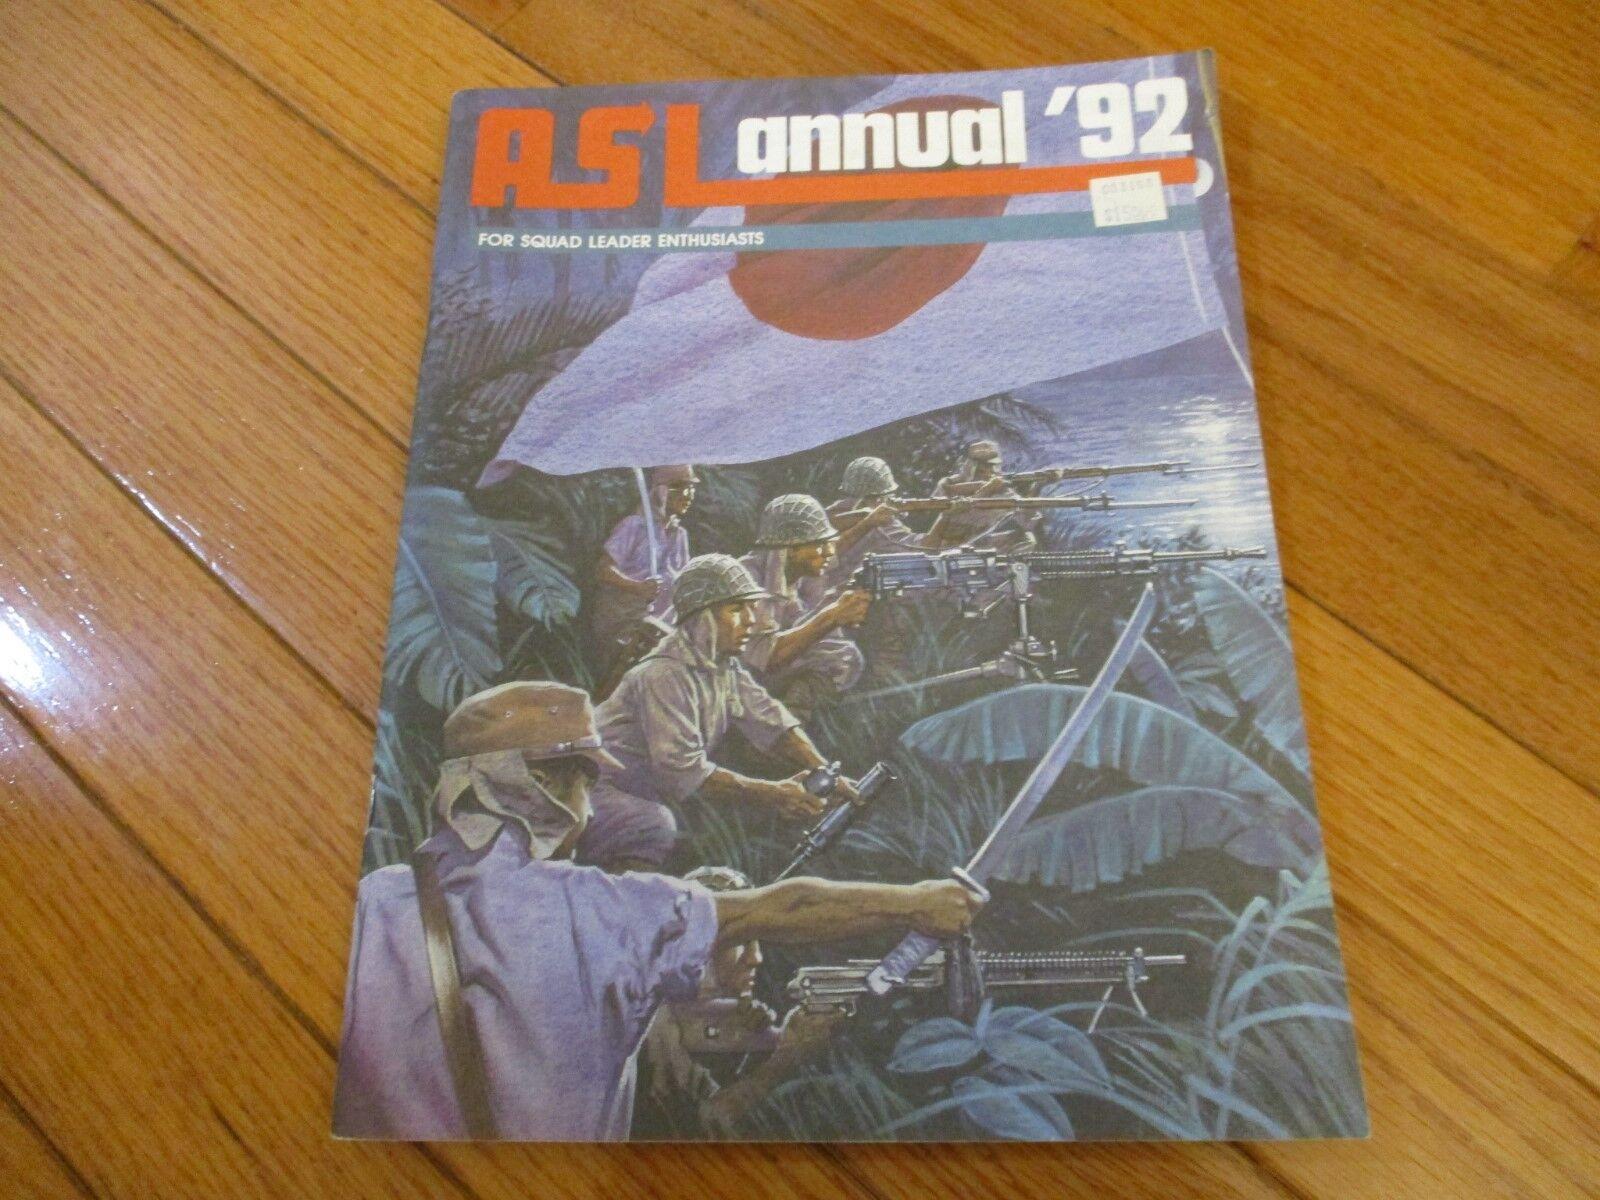 Avalon Hill ASL avanzada escuadrón líder ASL anual 92